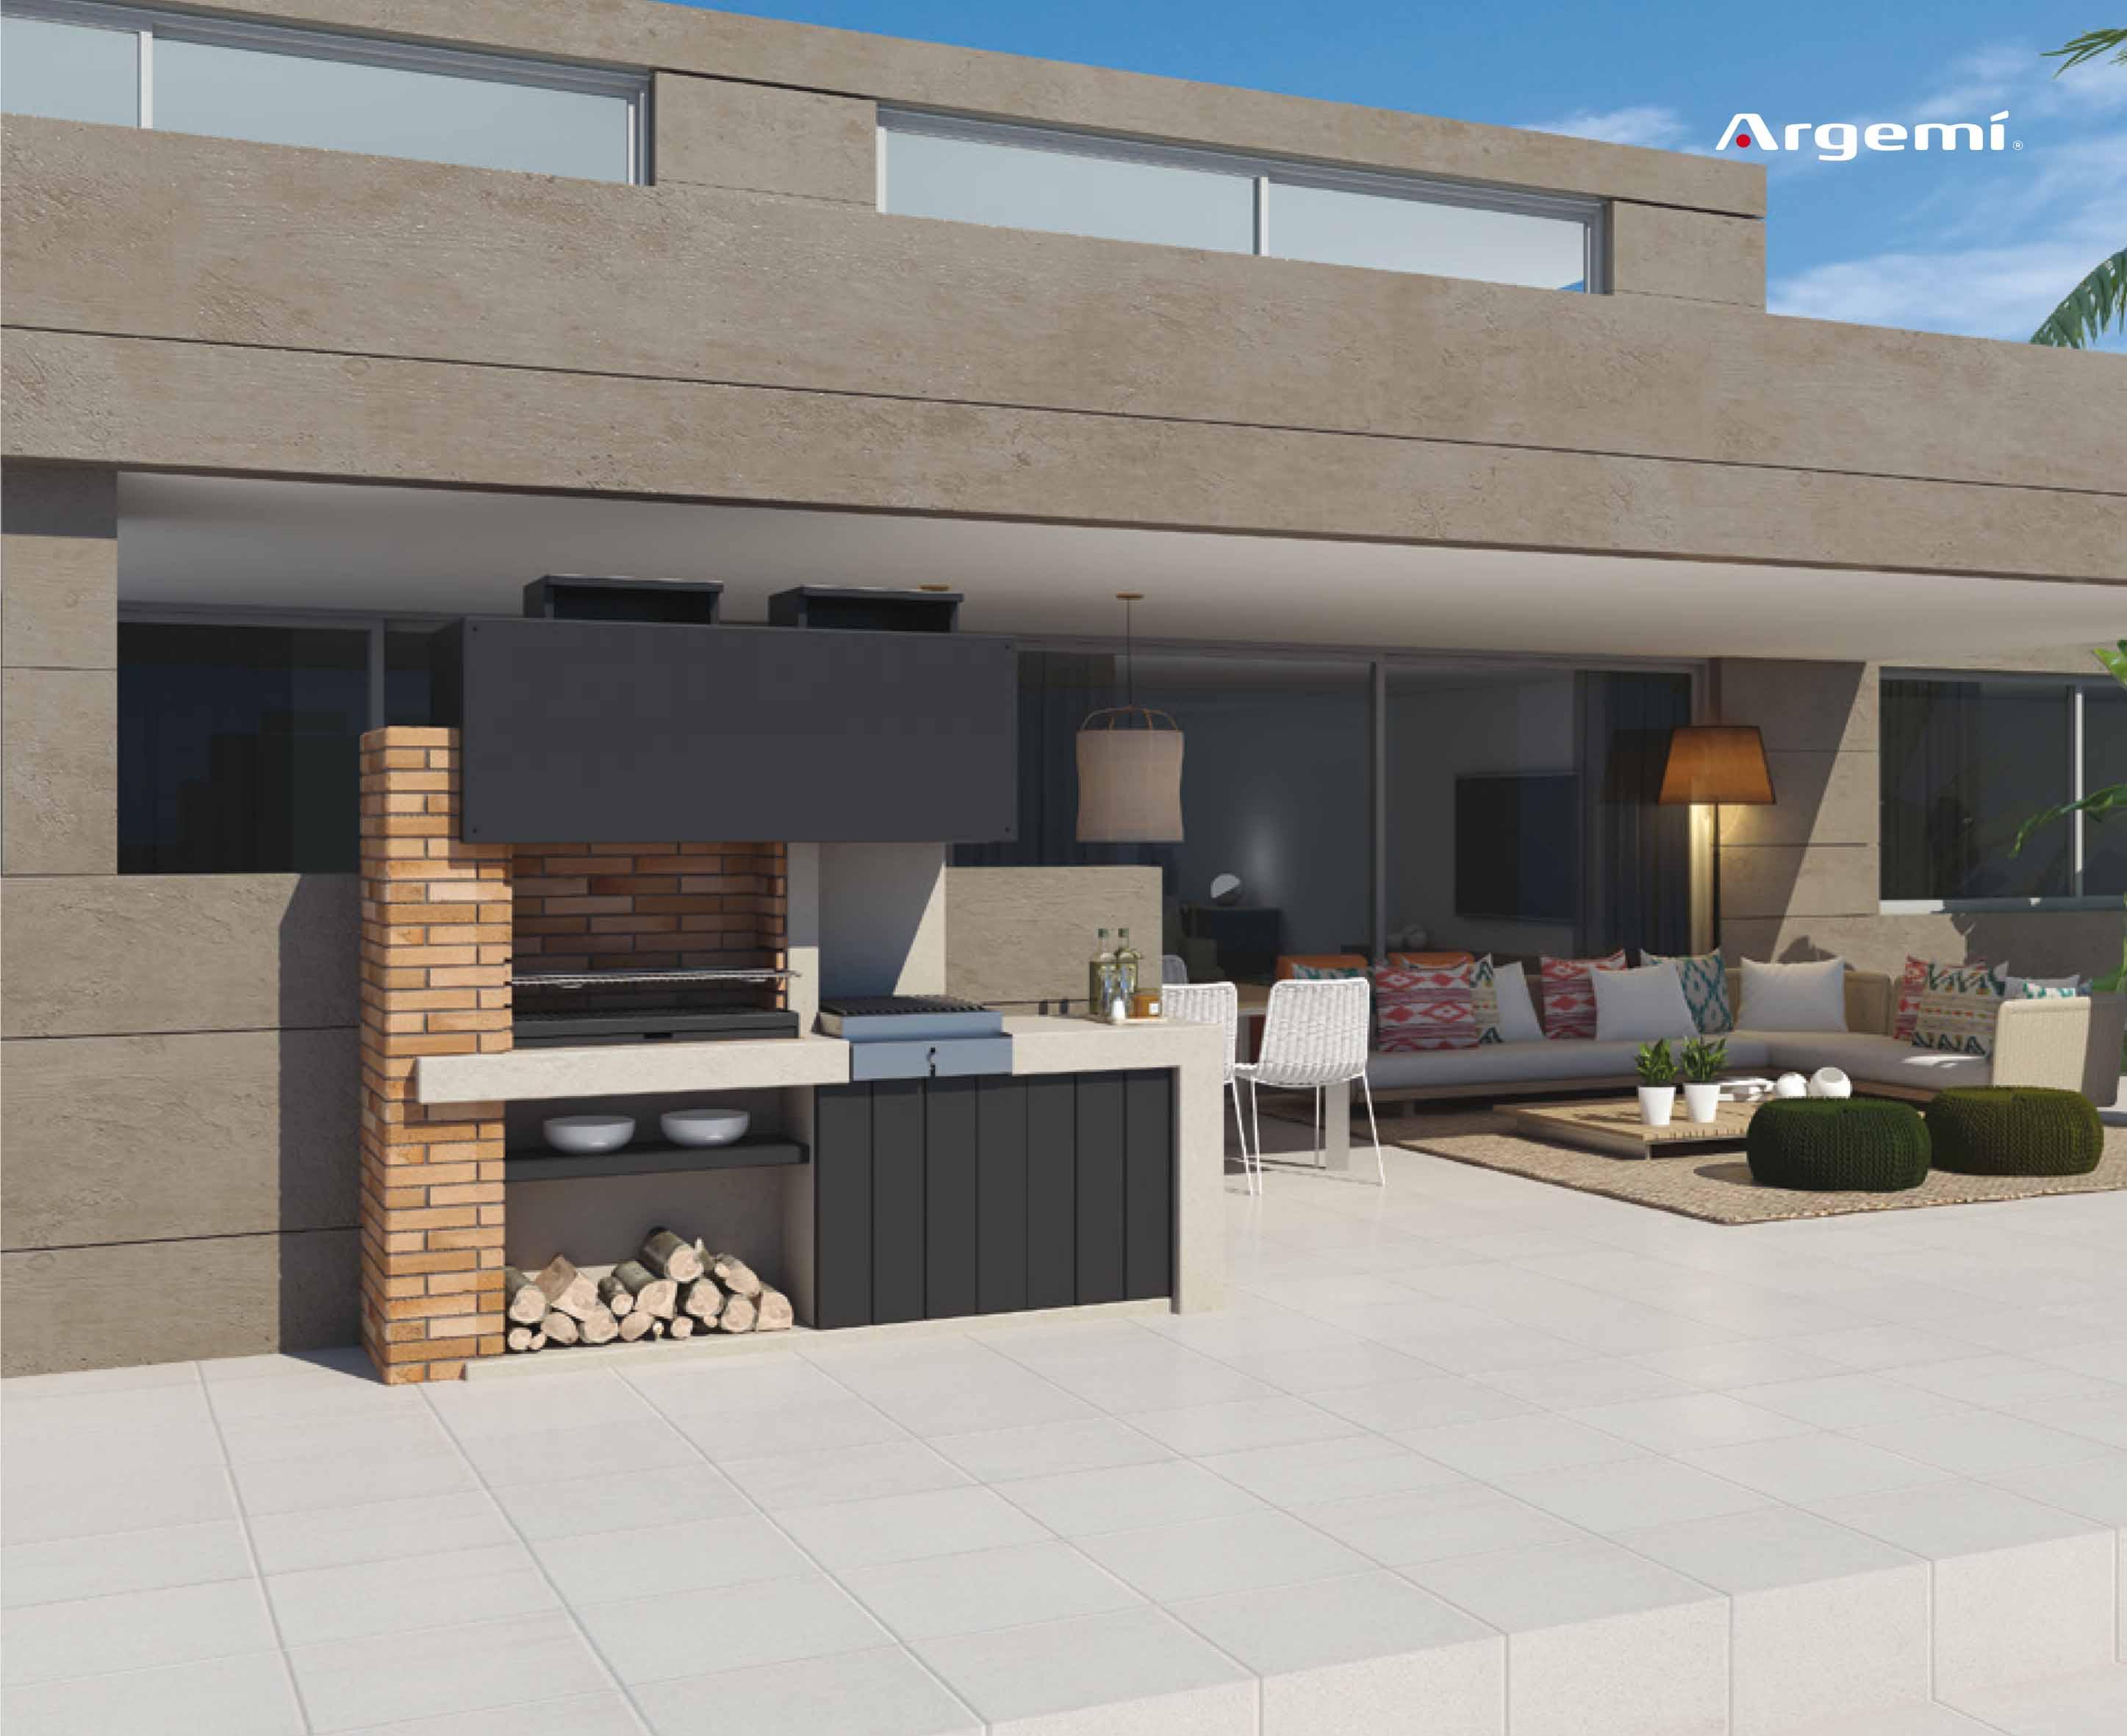 Barcelona barbacoes de disseny argemi prefabricats for Barbacoas de exterior